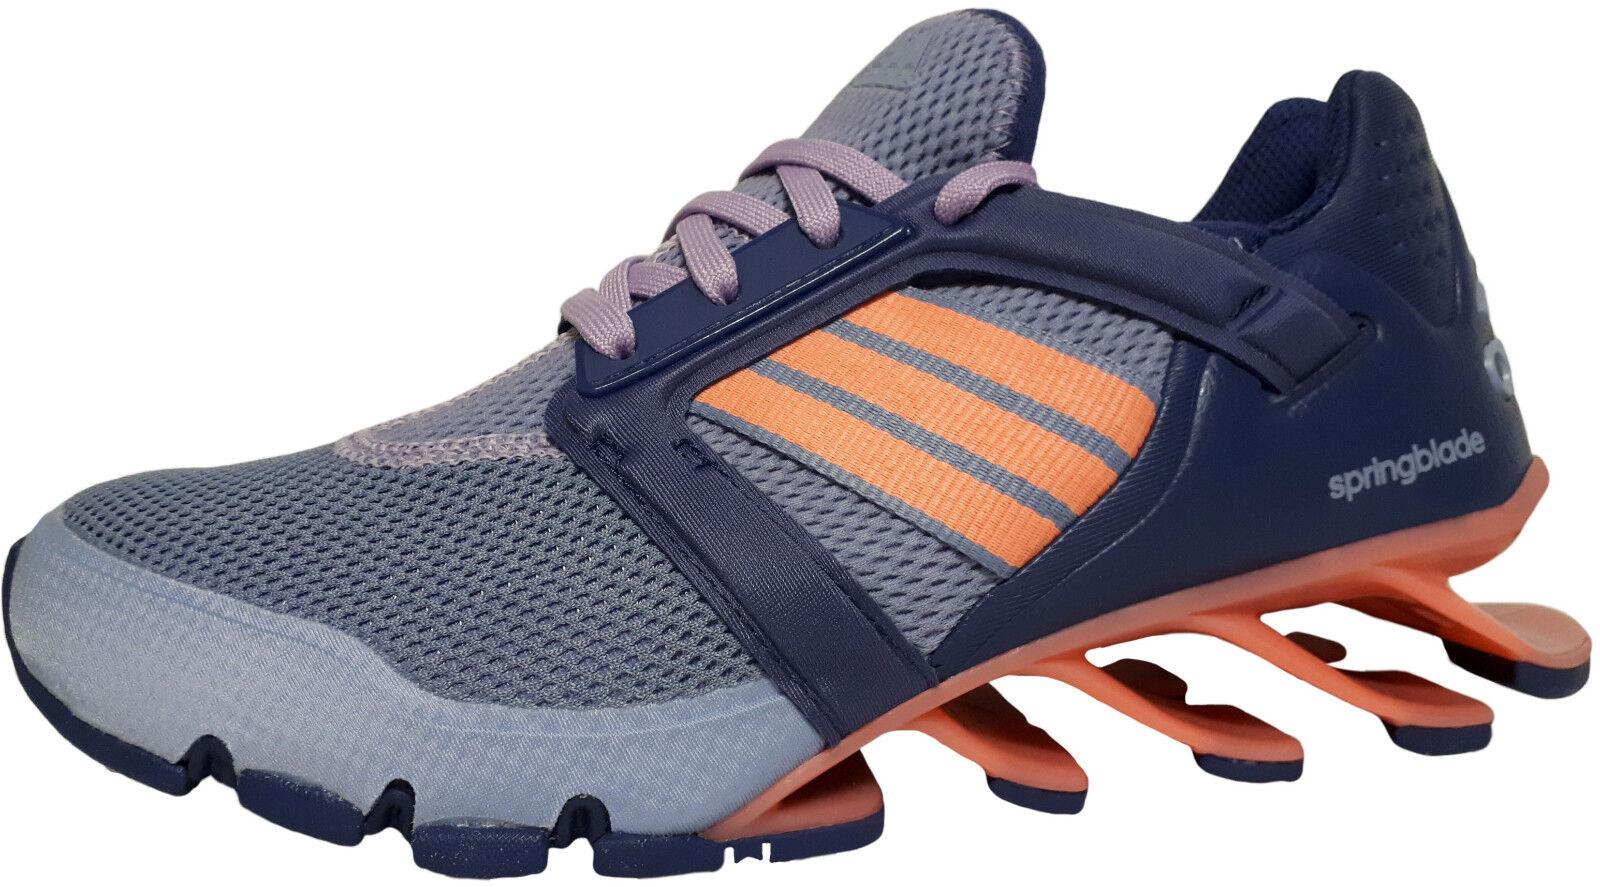 W Señora Springblade Zapatillas Force Adidas E wOXkuZiTP